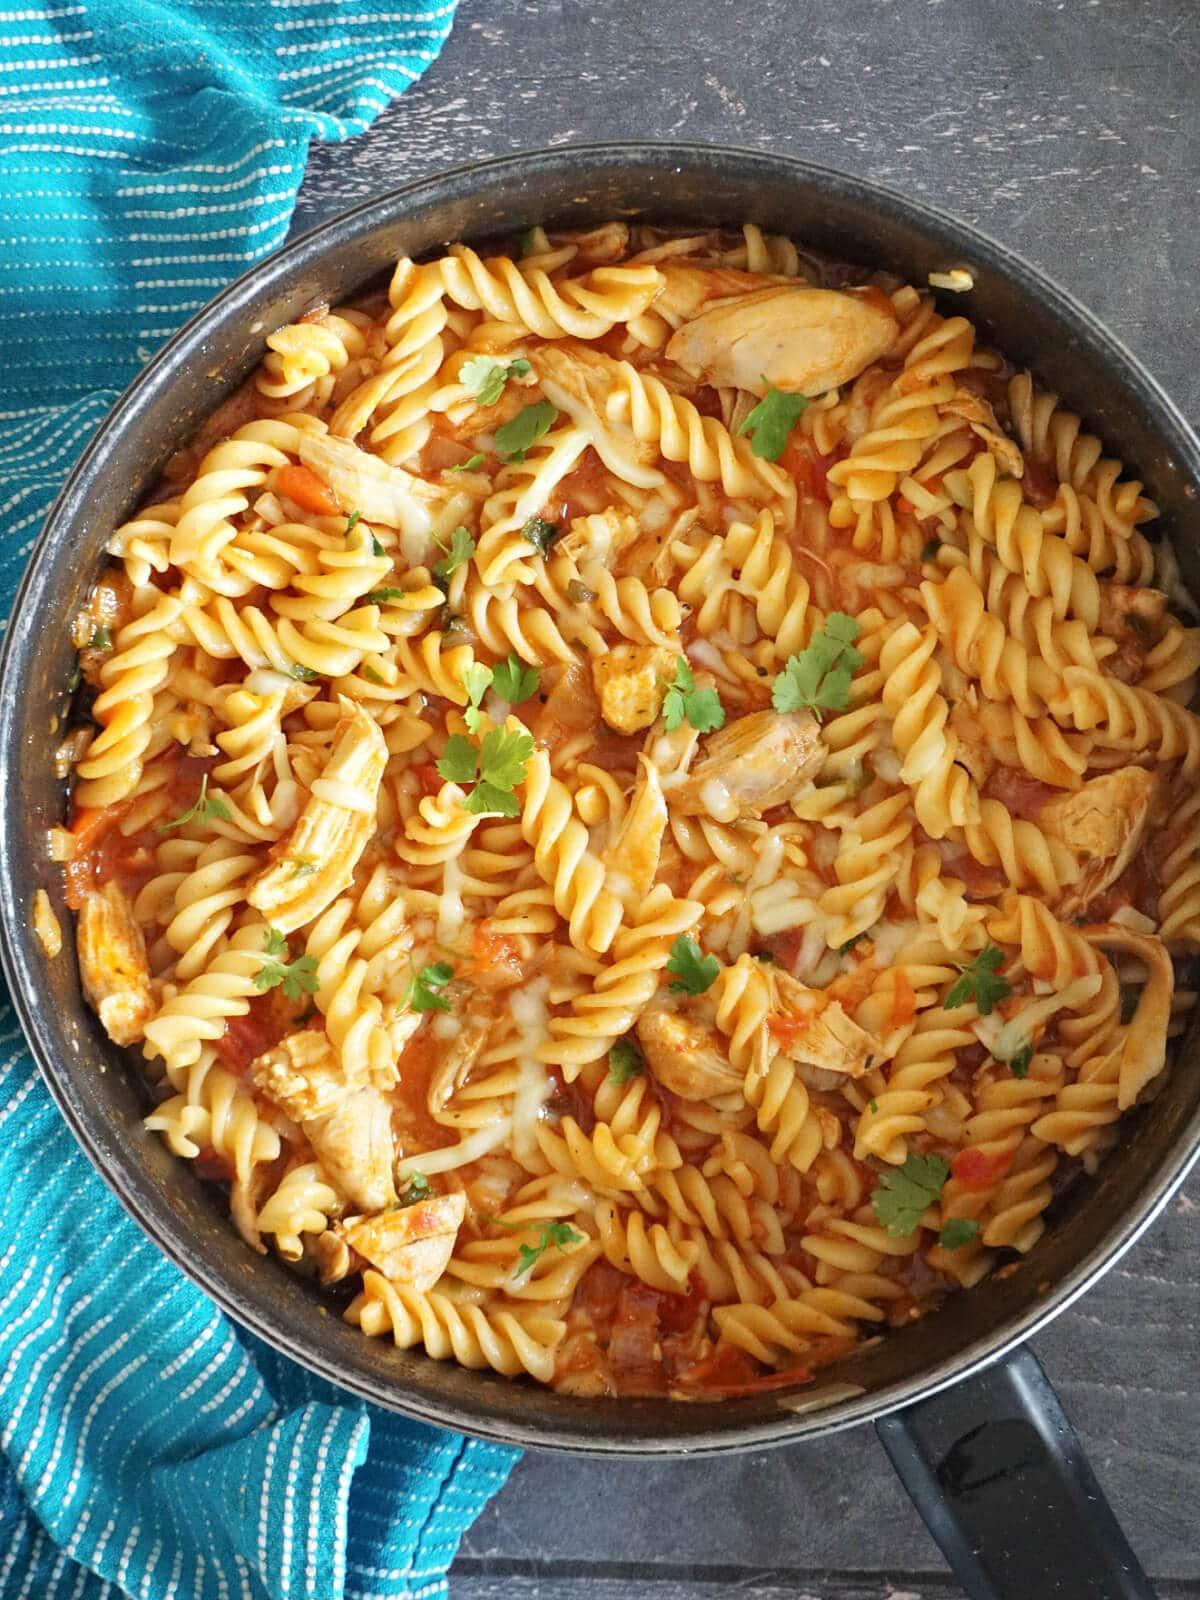 Overhead shot of a pot of chicken pasta